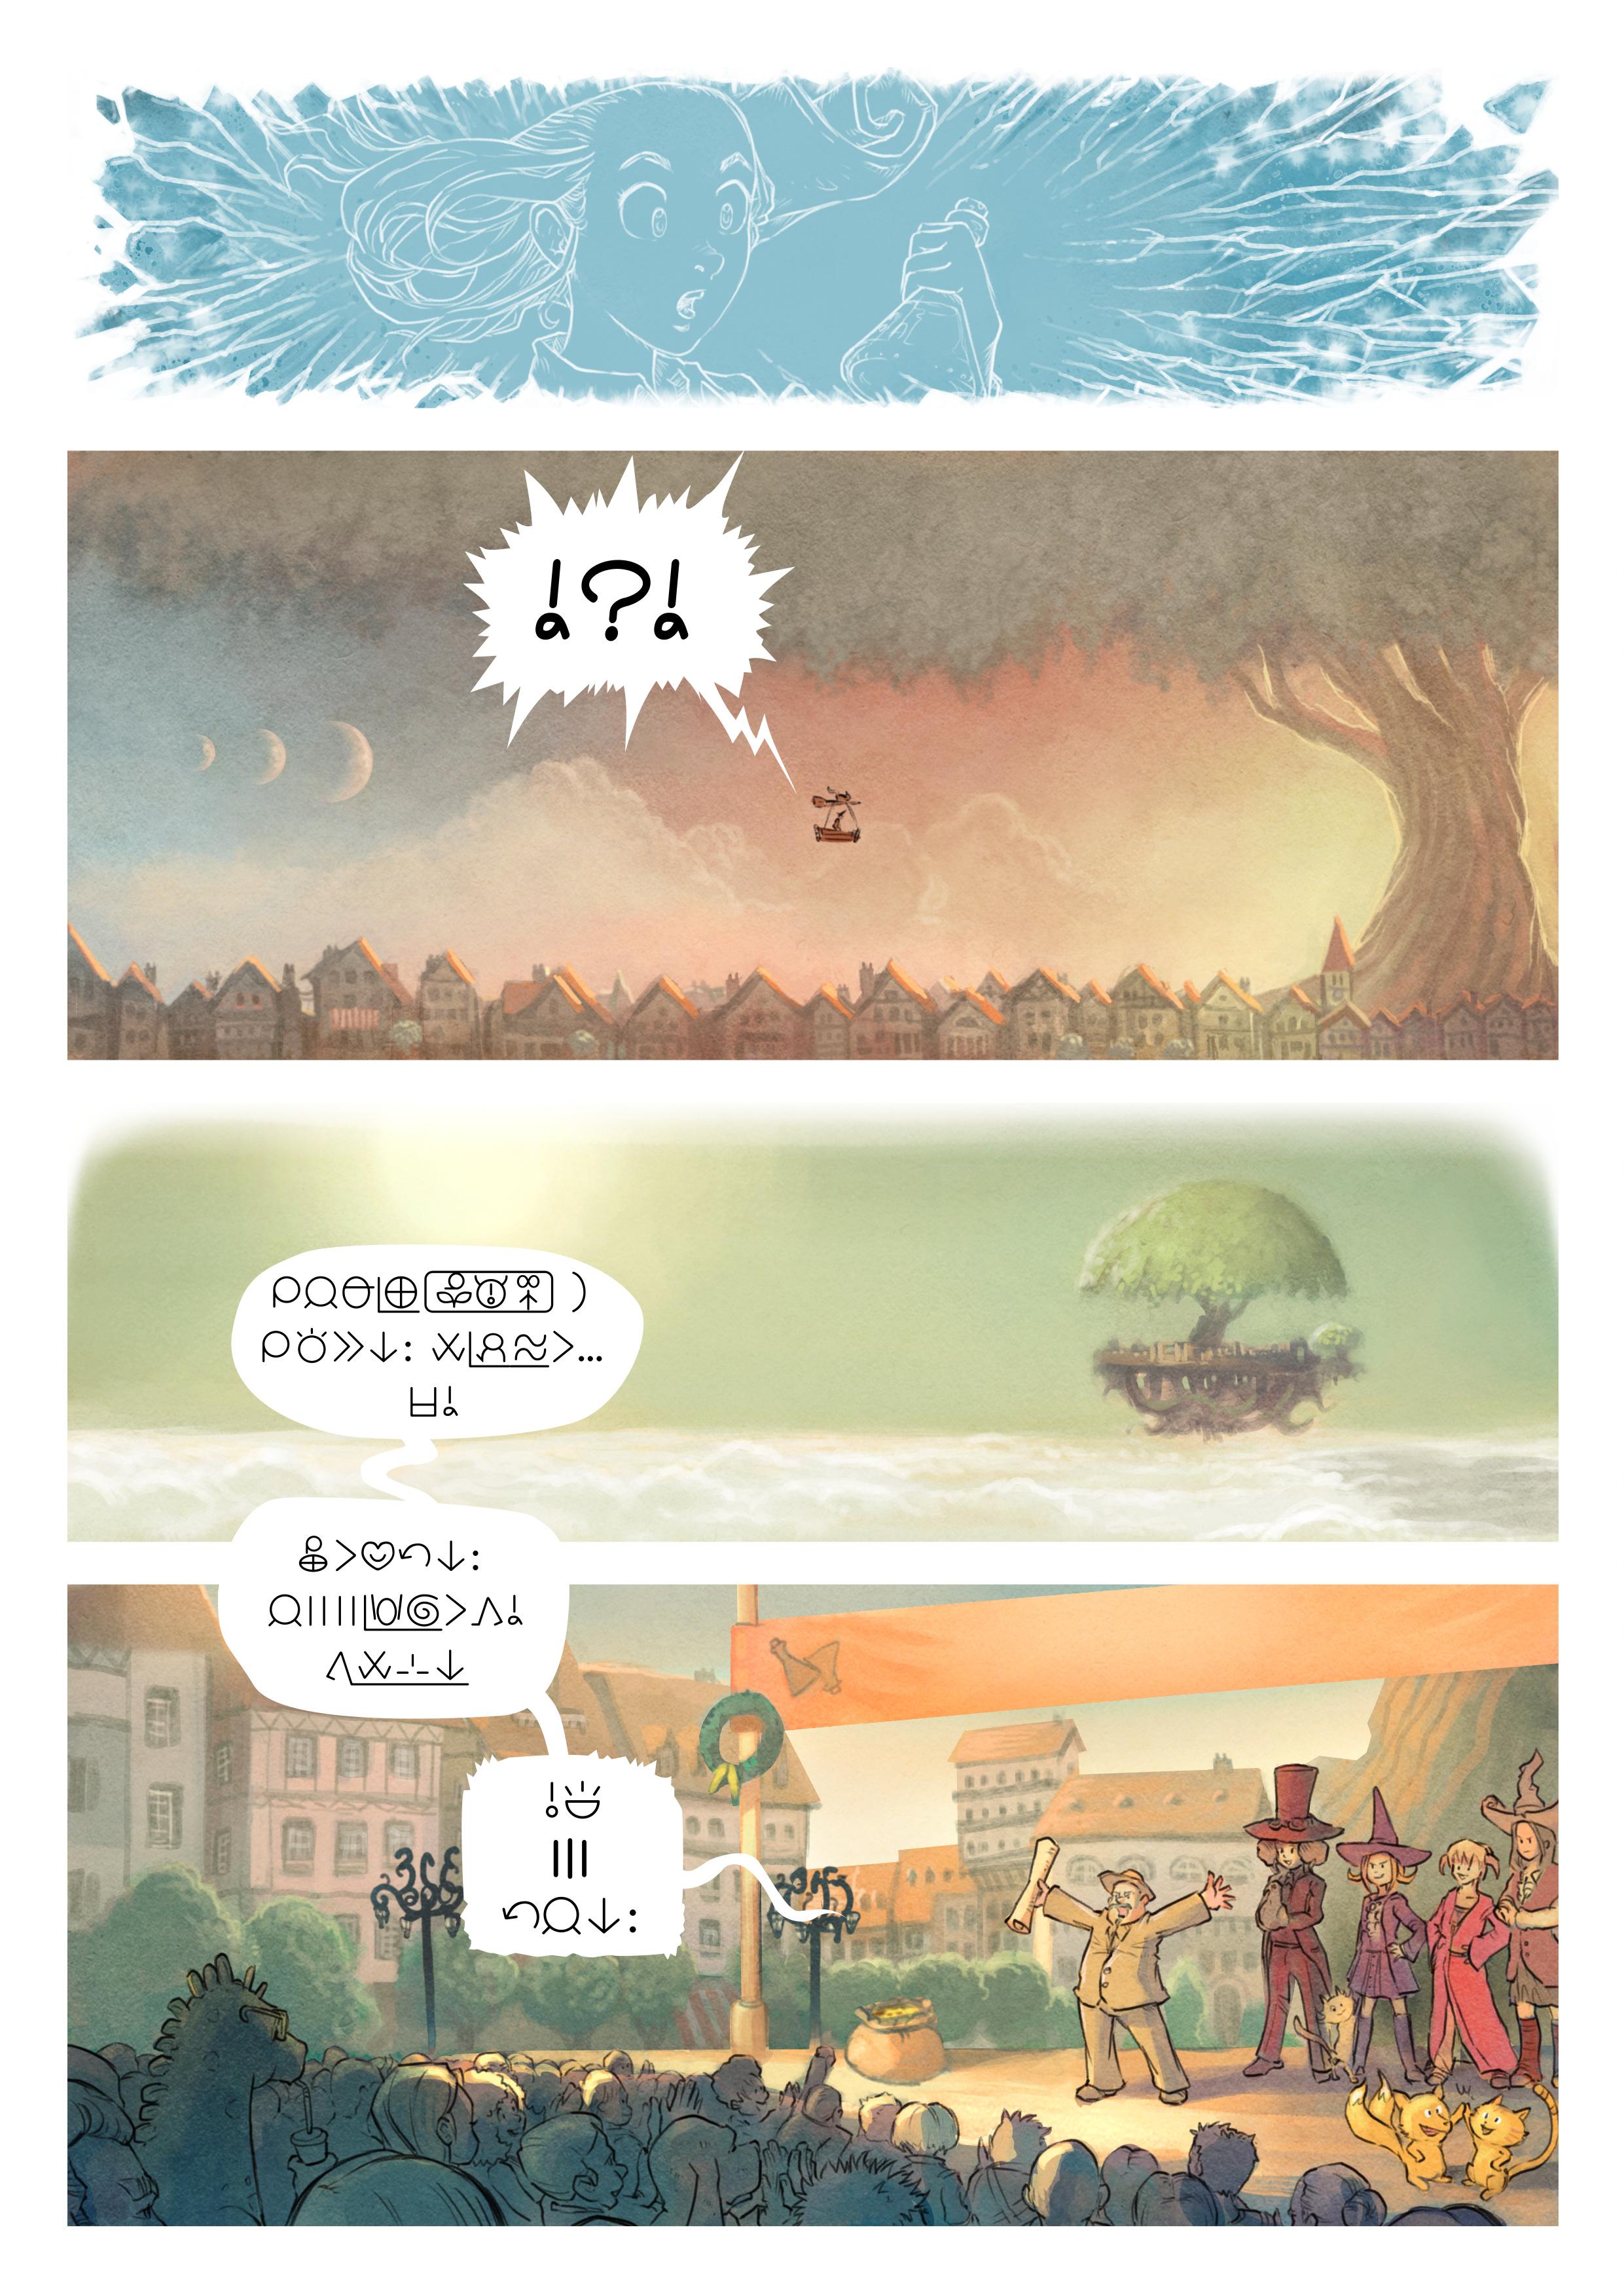 lipu nanpa luka wan: utala pi+__pali__telo, lipu lili nanpa 3